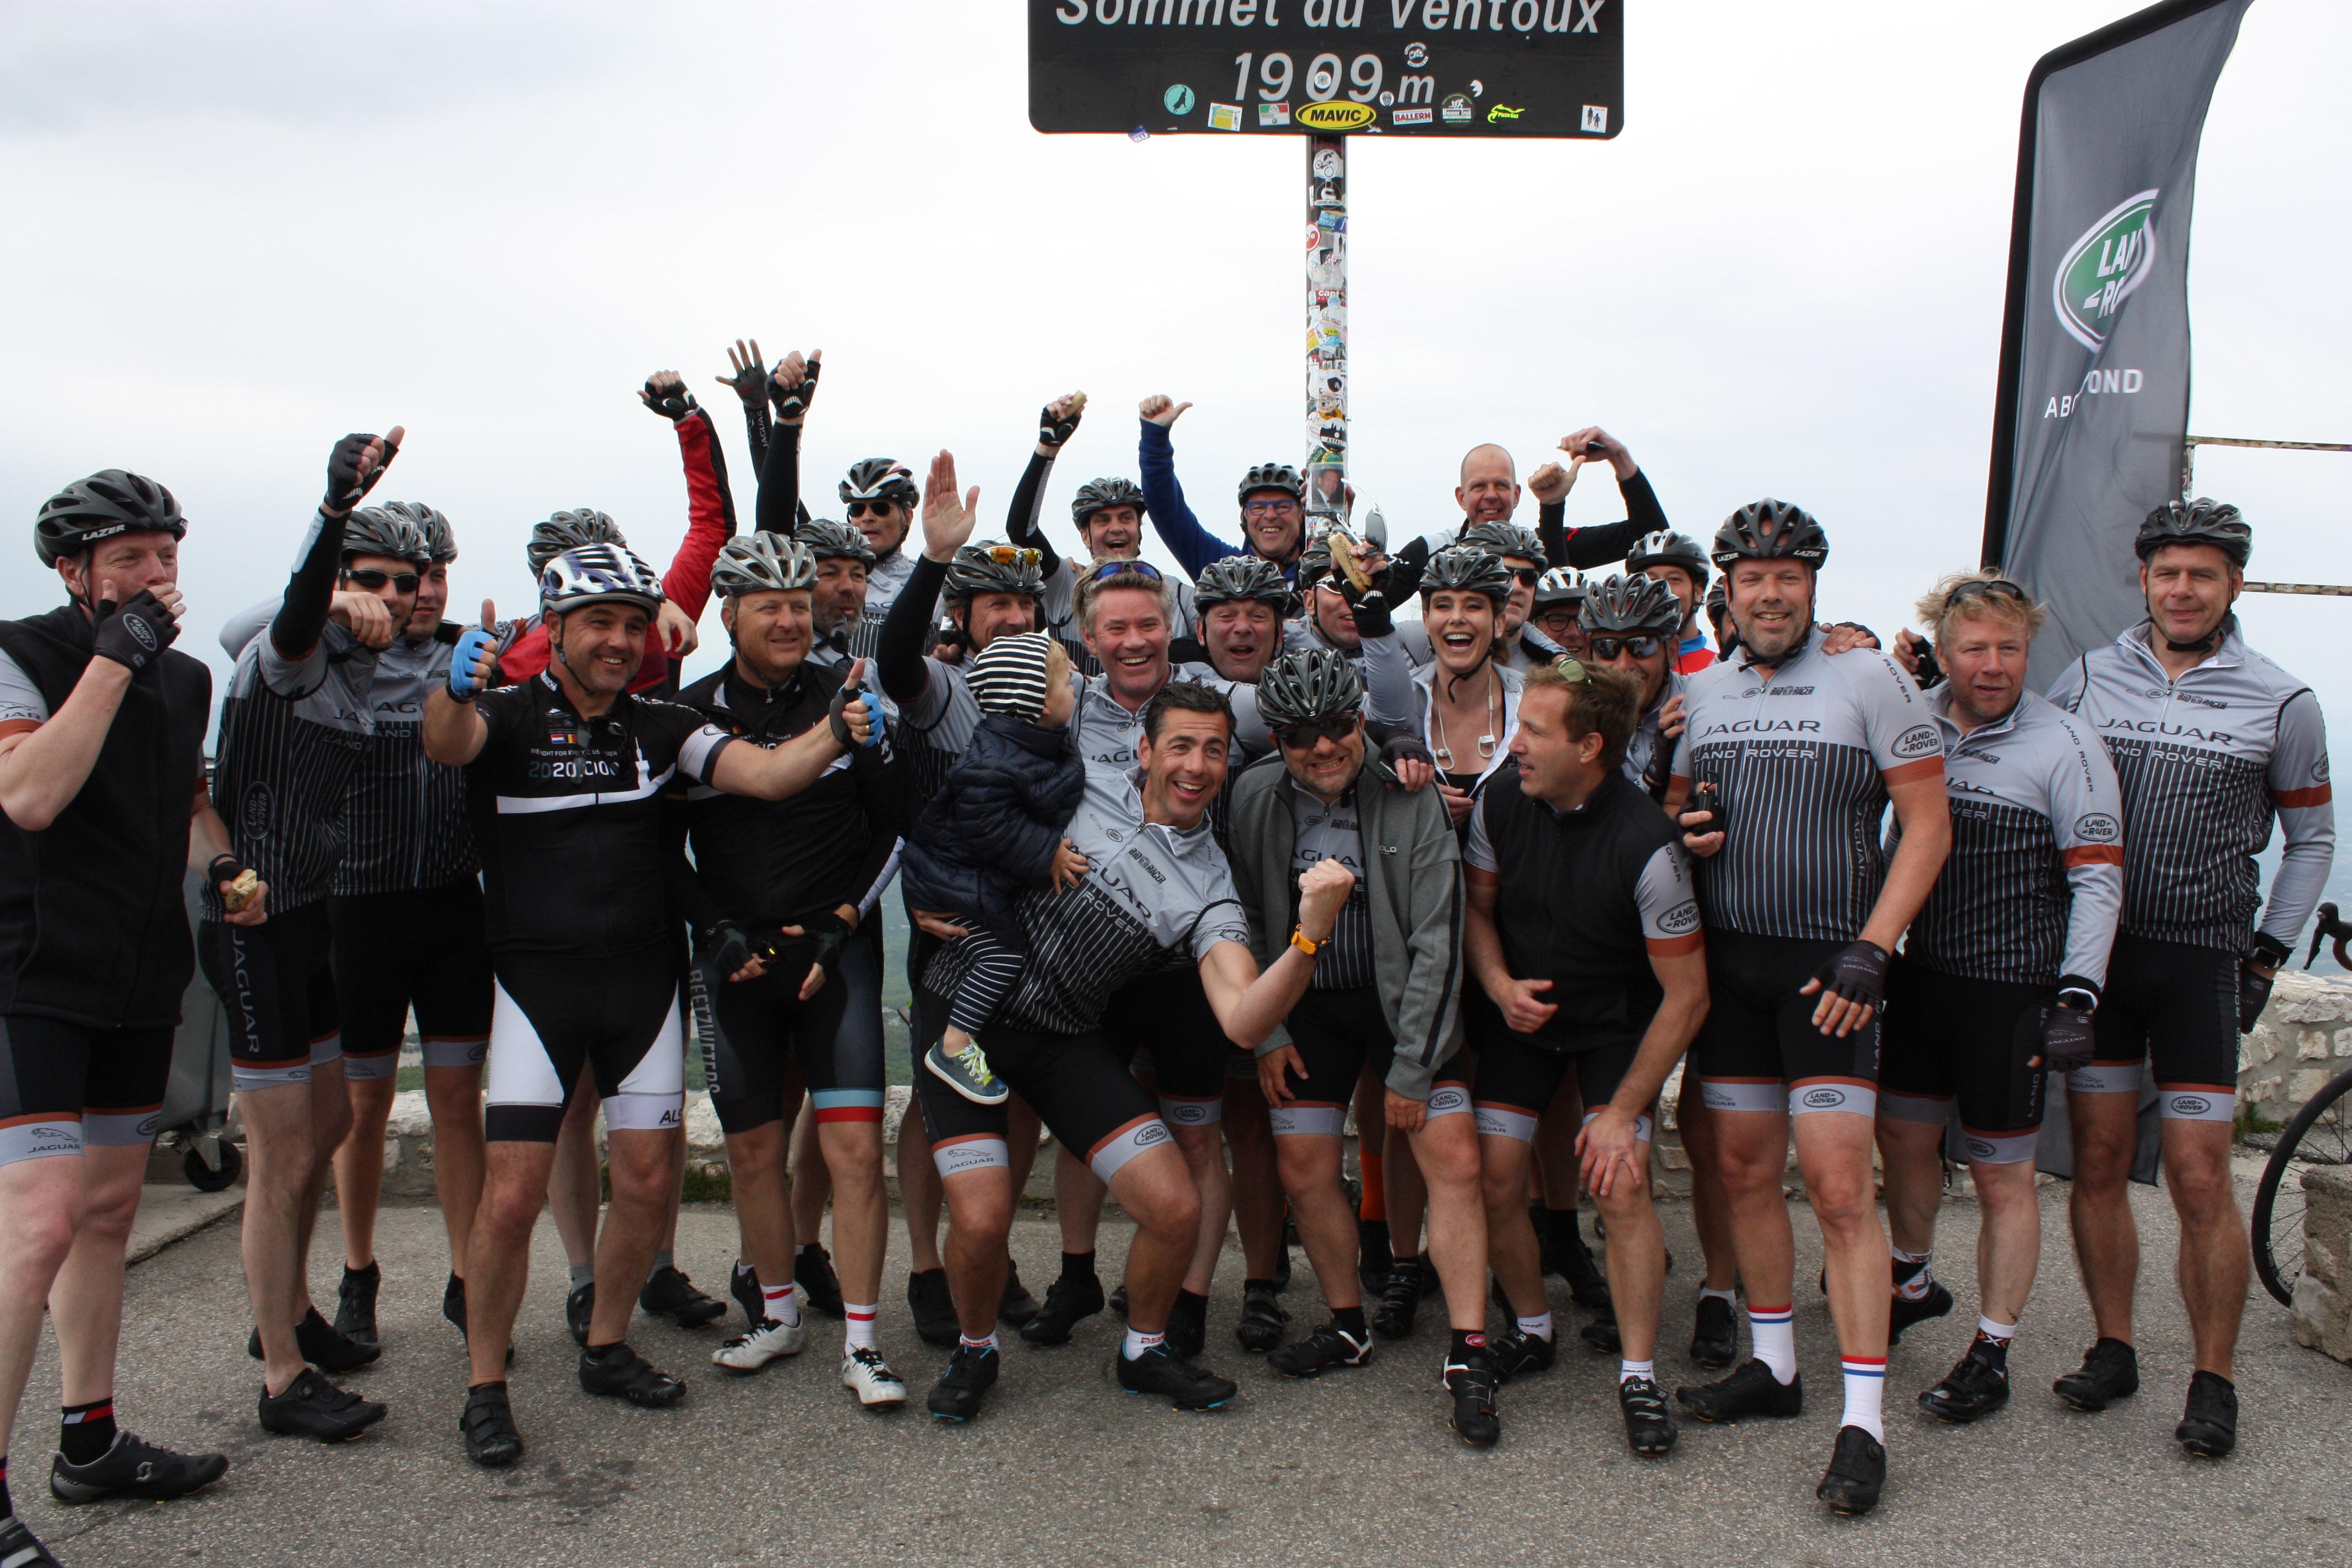 284914 jlr leden beklimmen mont ventoux per fiets 04d021 original 1531395432